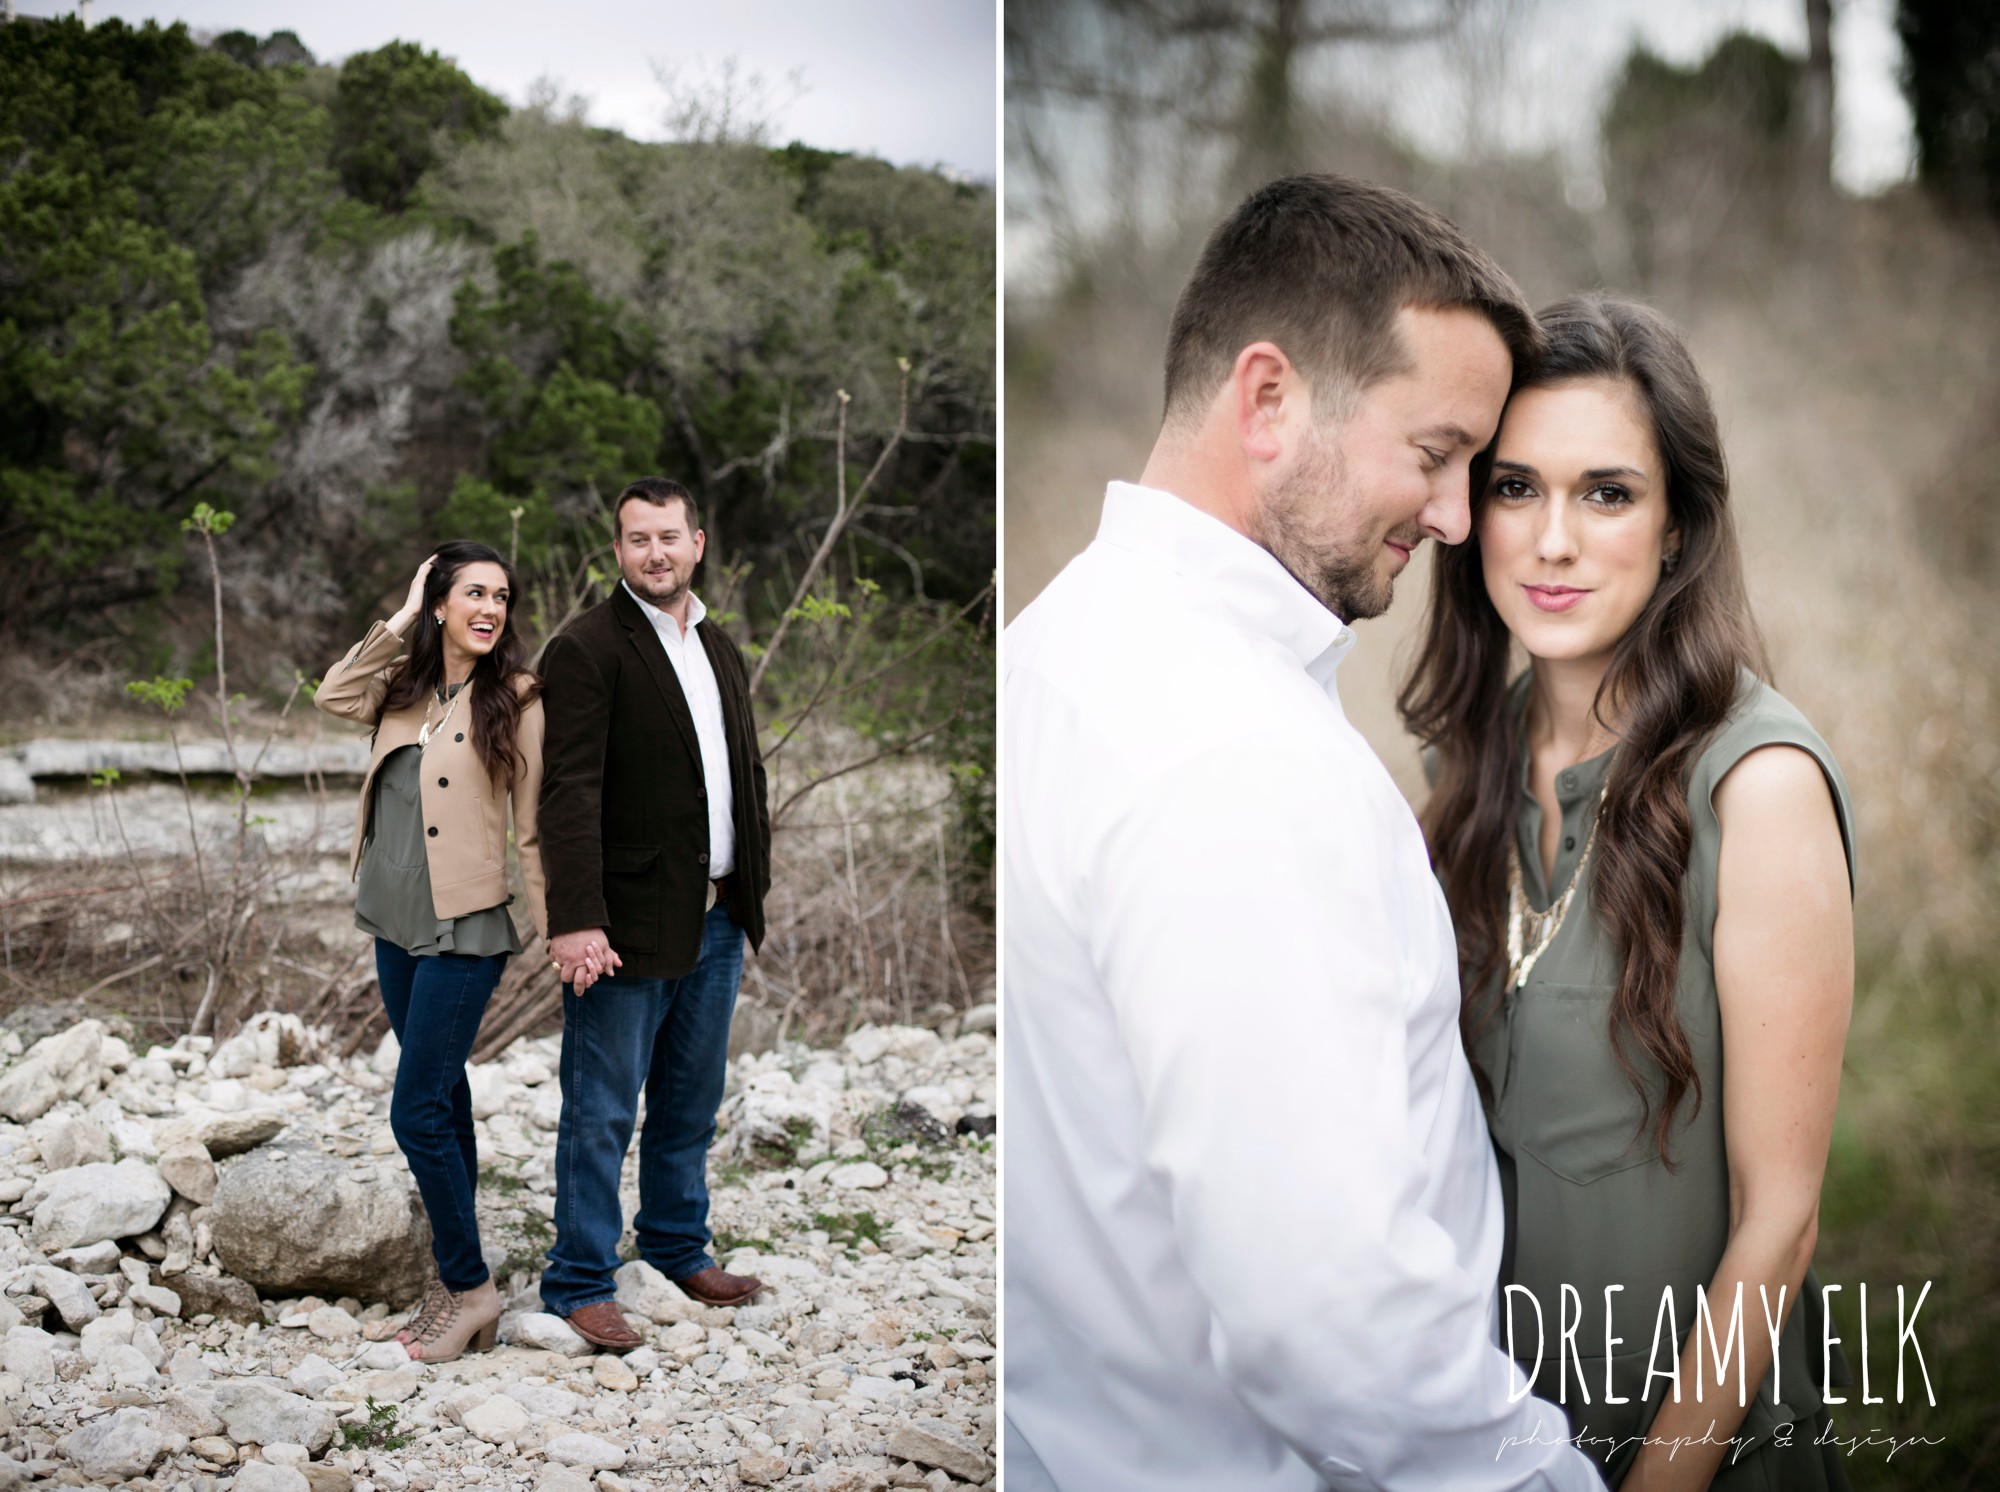 fun anniversary photo shoot, bull creek park, austin, texas {dreamy elk photography and design}